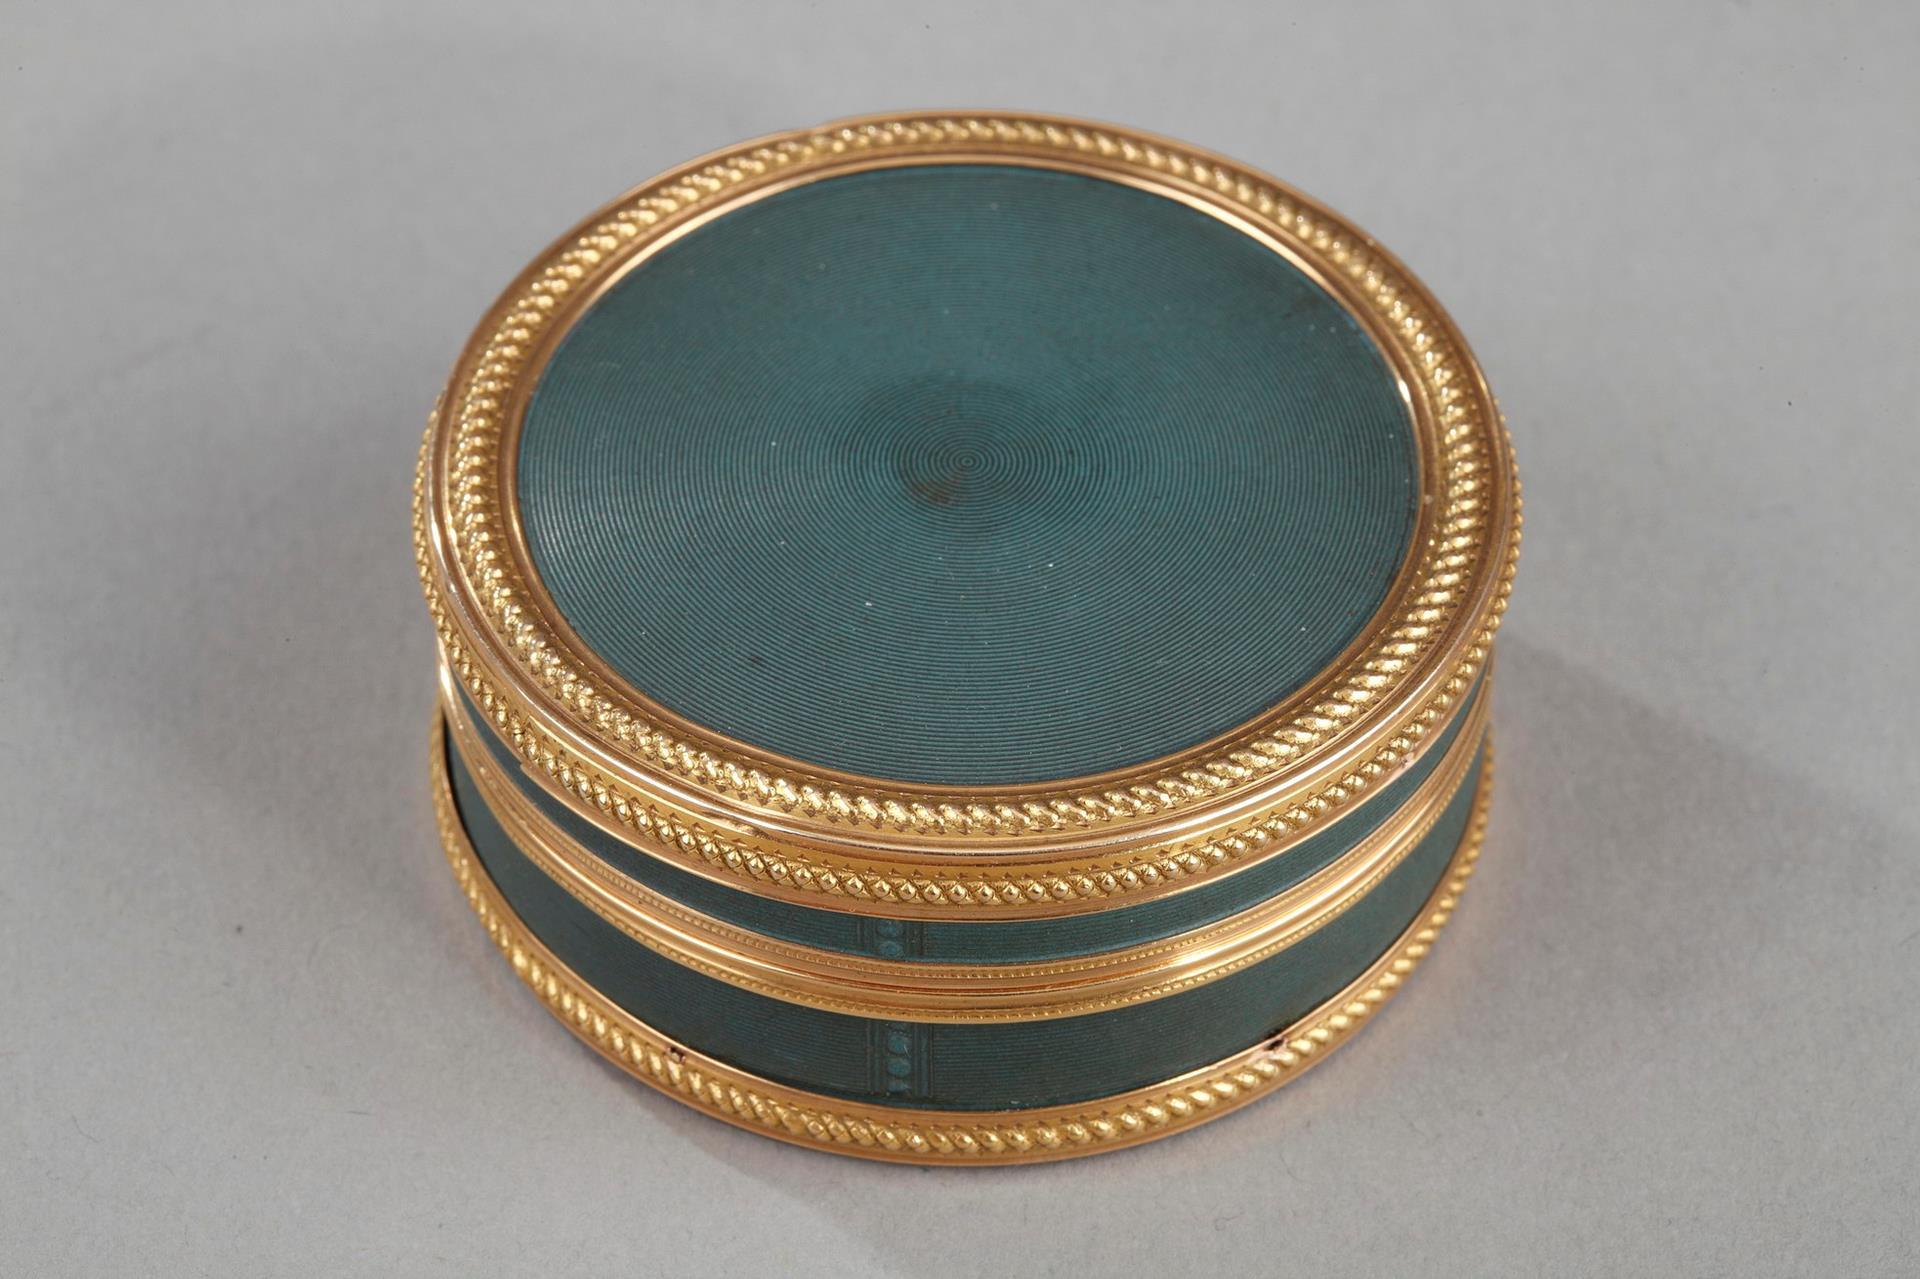 Louis XVI Candy box in gold. Circa 1782.